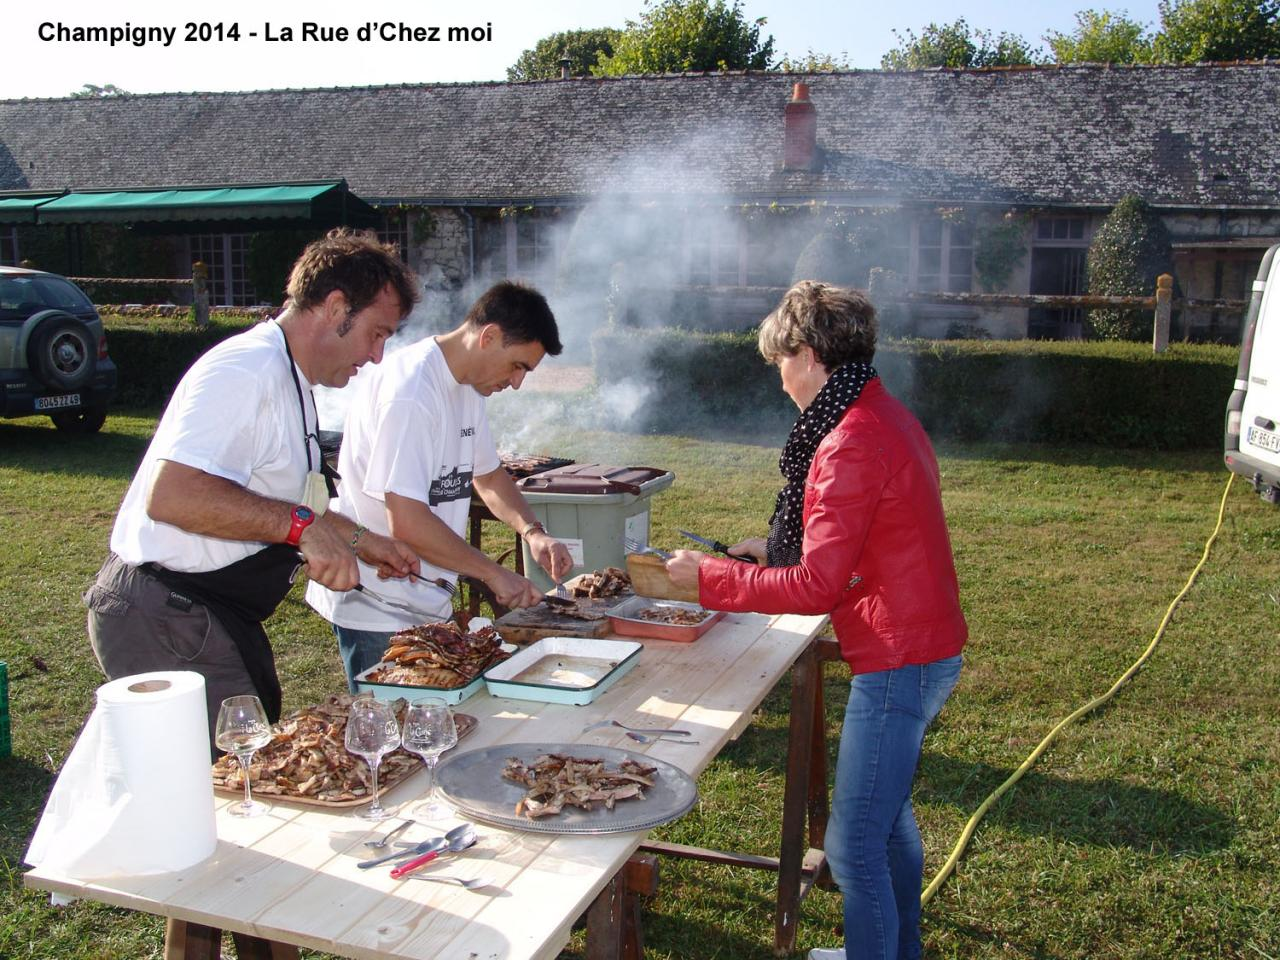 Champigny 2014 - Rue d'Chez Moi (14)